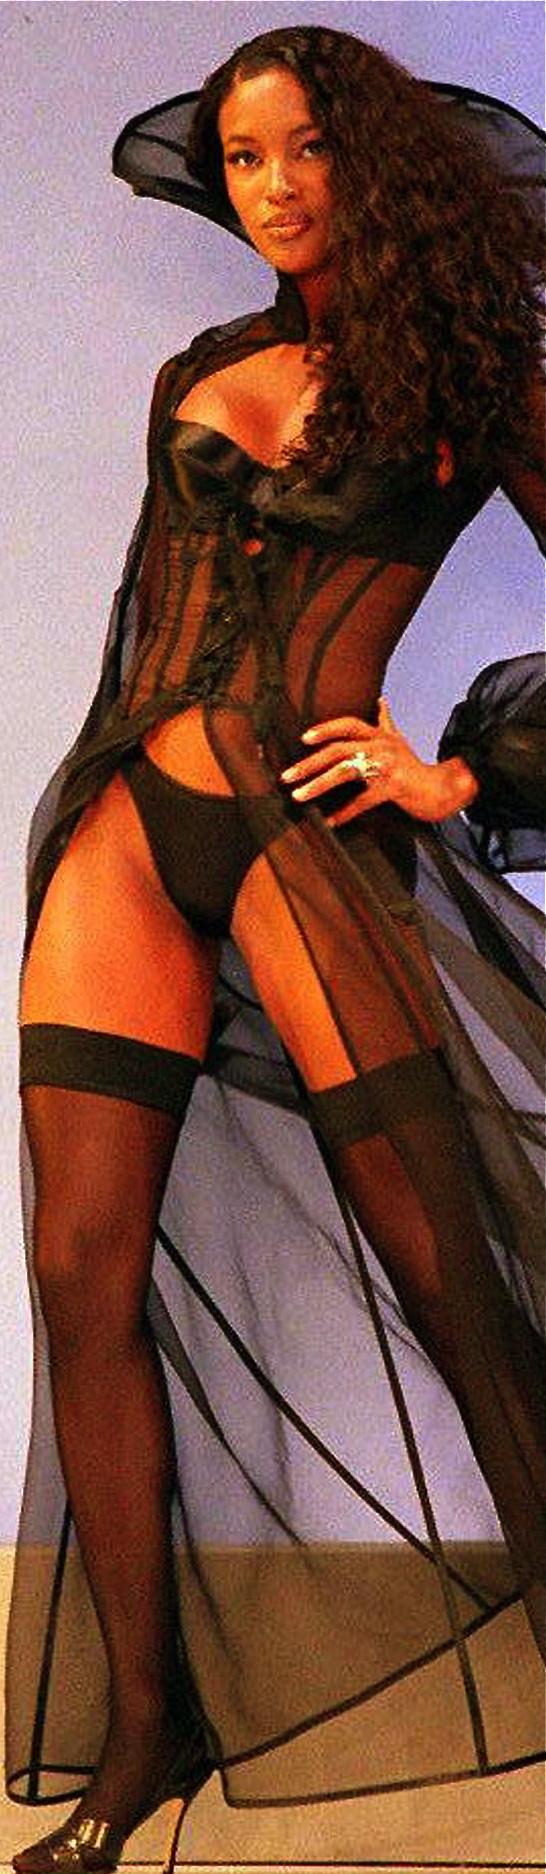 El desnudo total de Naomi Campbell en Vogue - Infobae